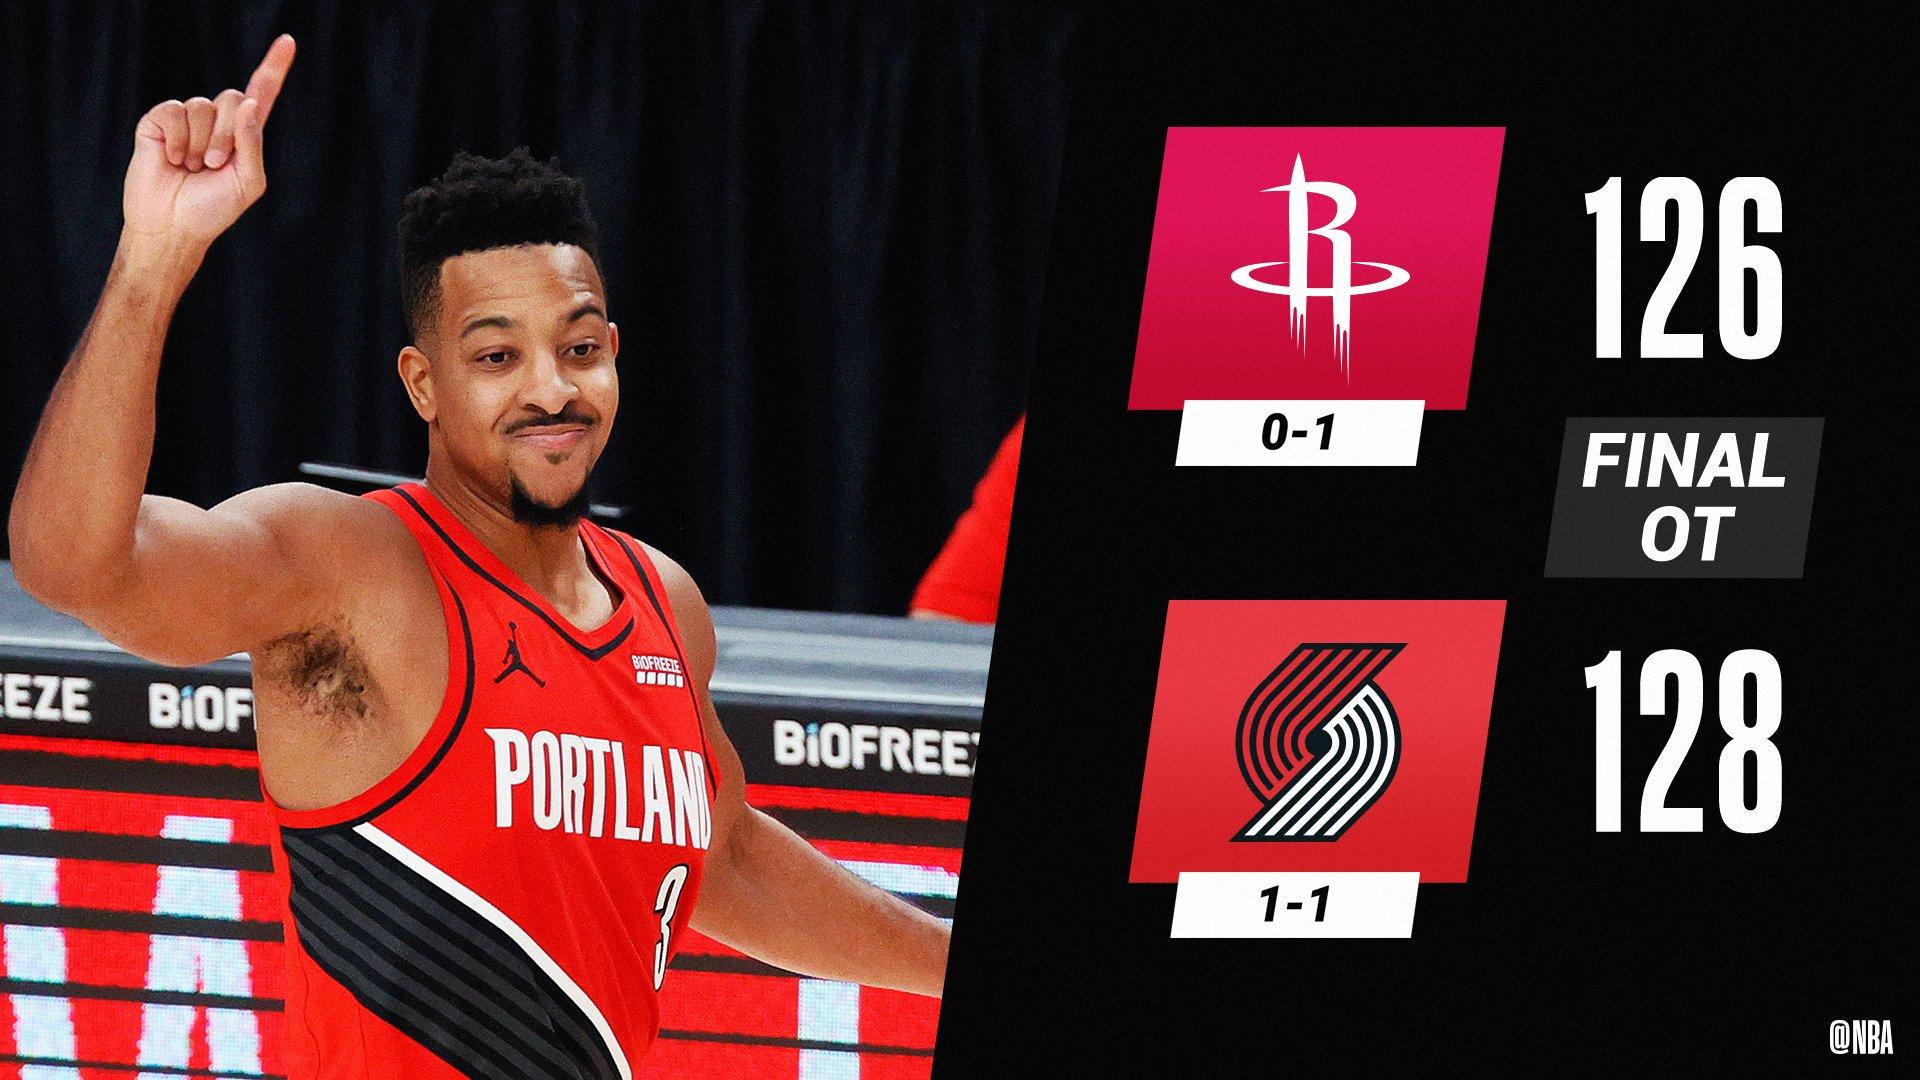 27-12-1